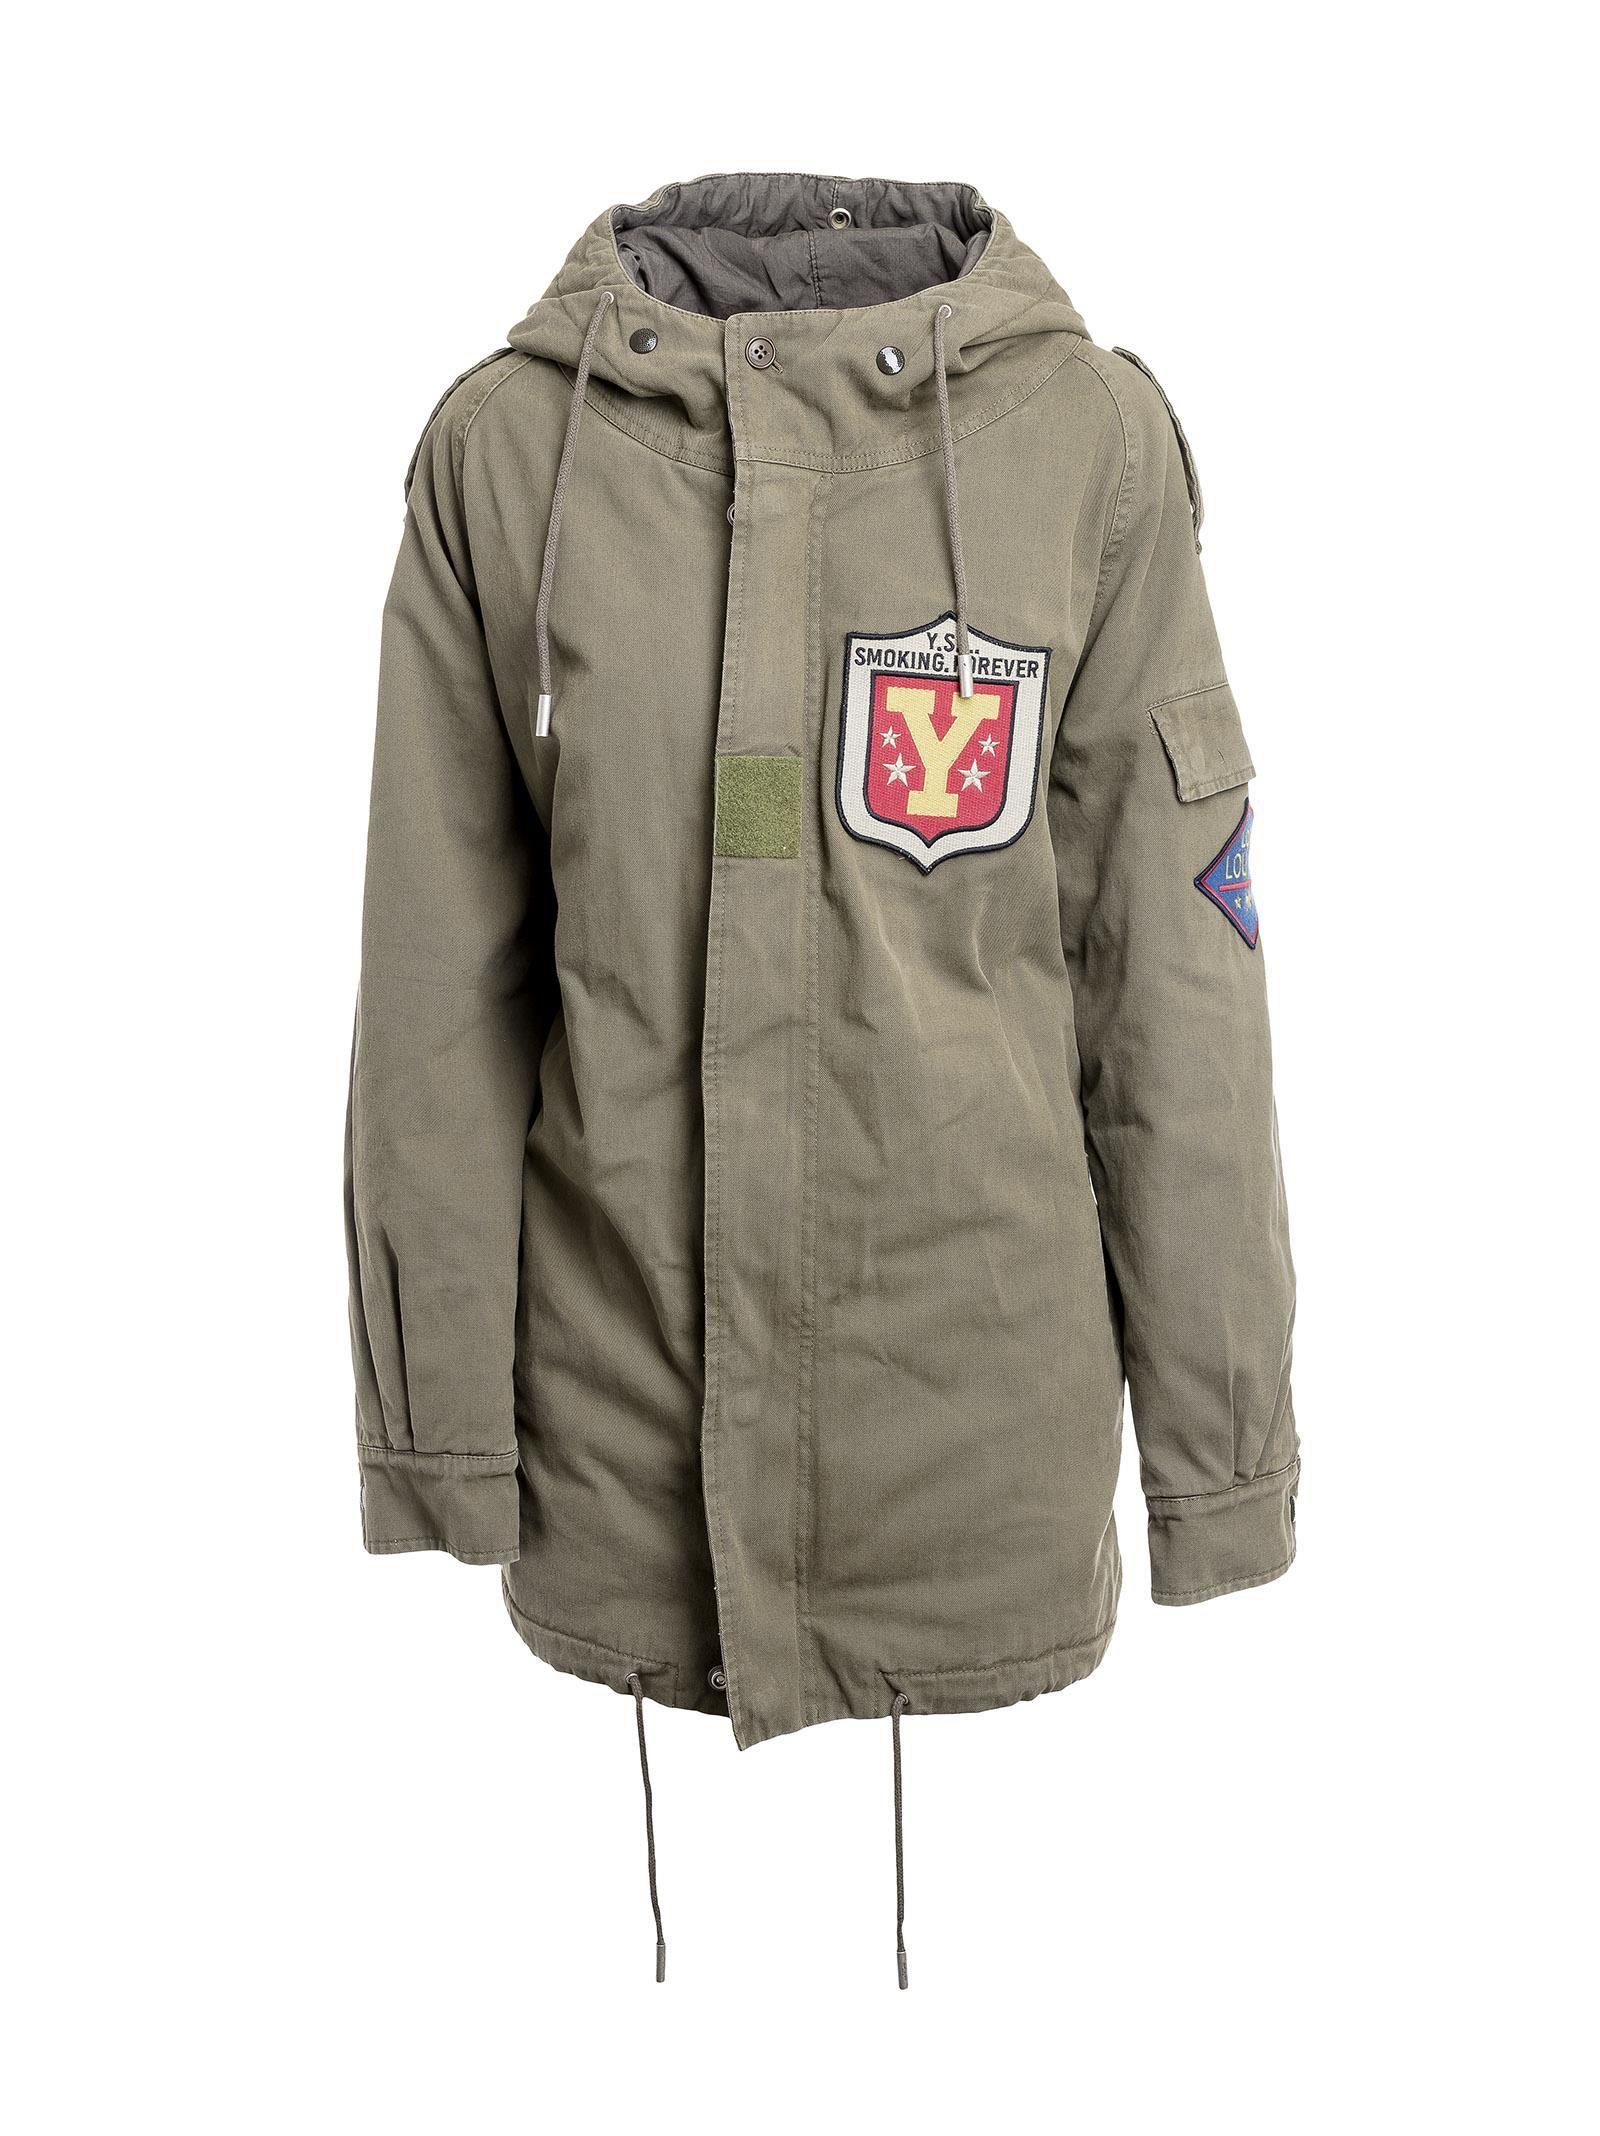 Saint Laurent - Saint Laurent Hooded Military Parka Coat - KHAKI ...